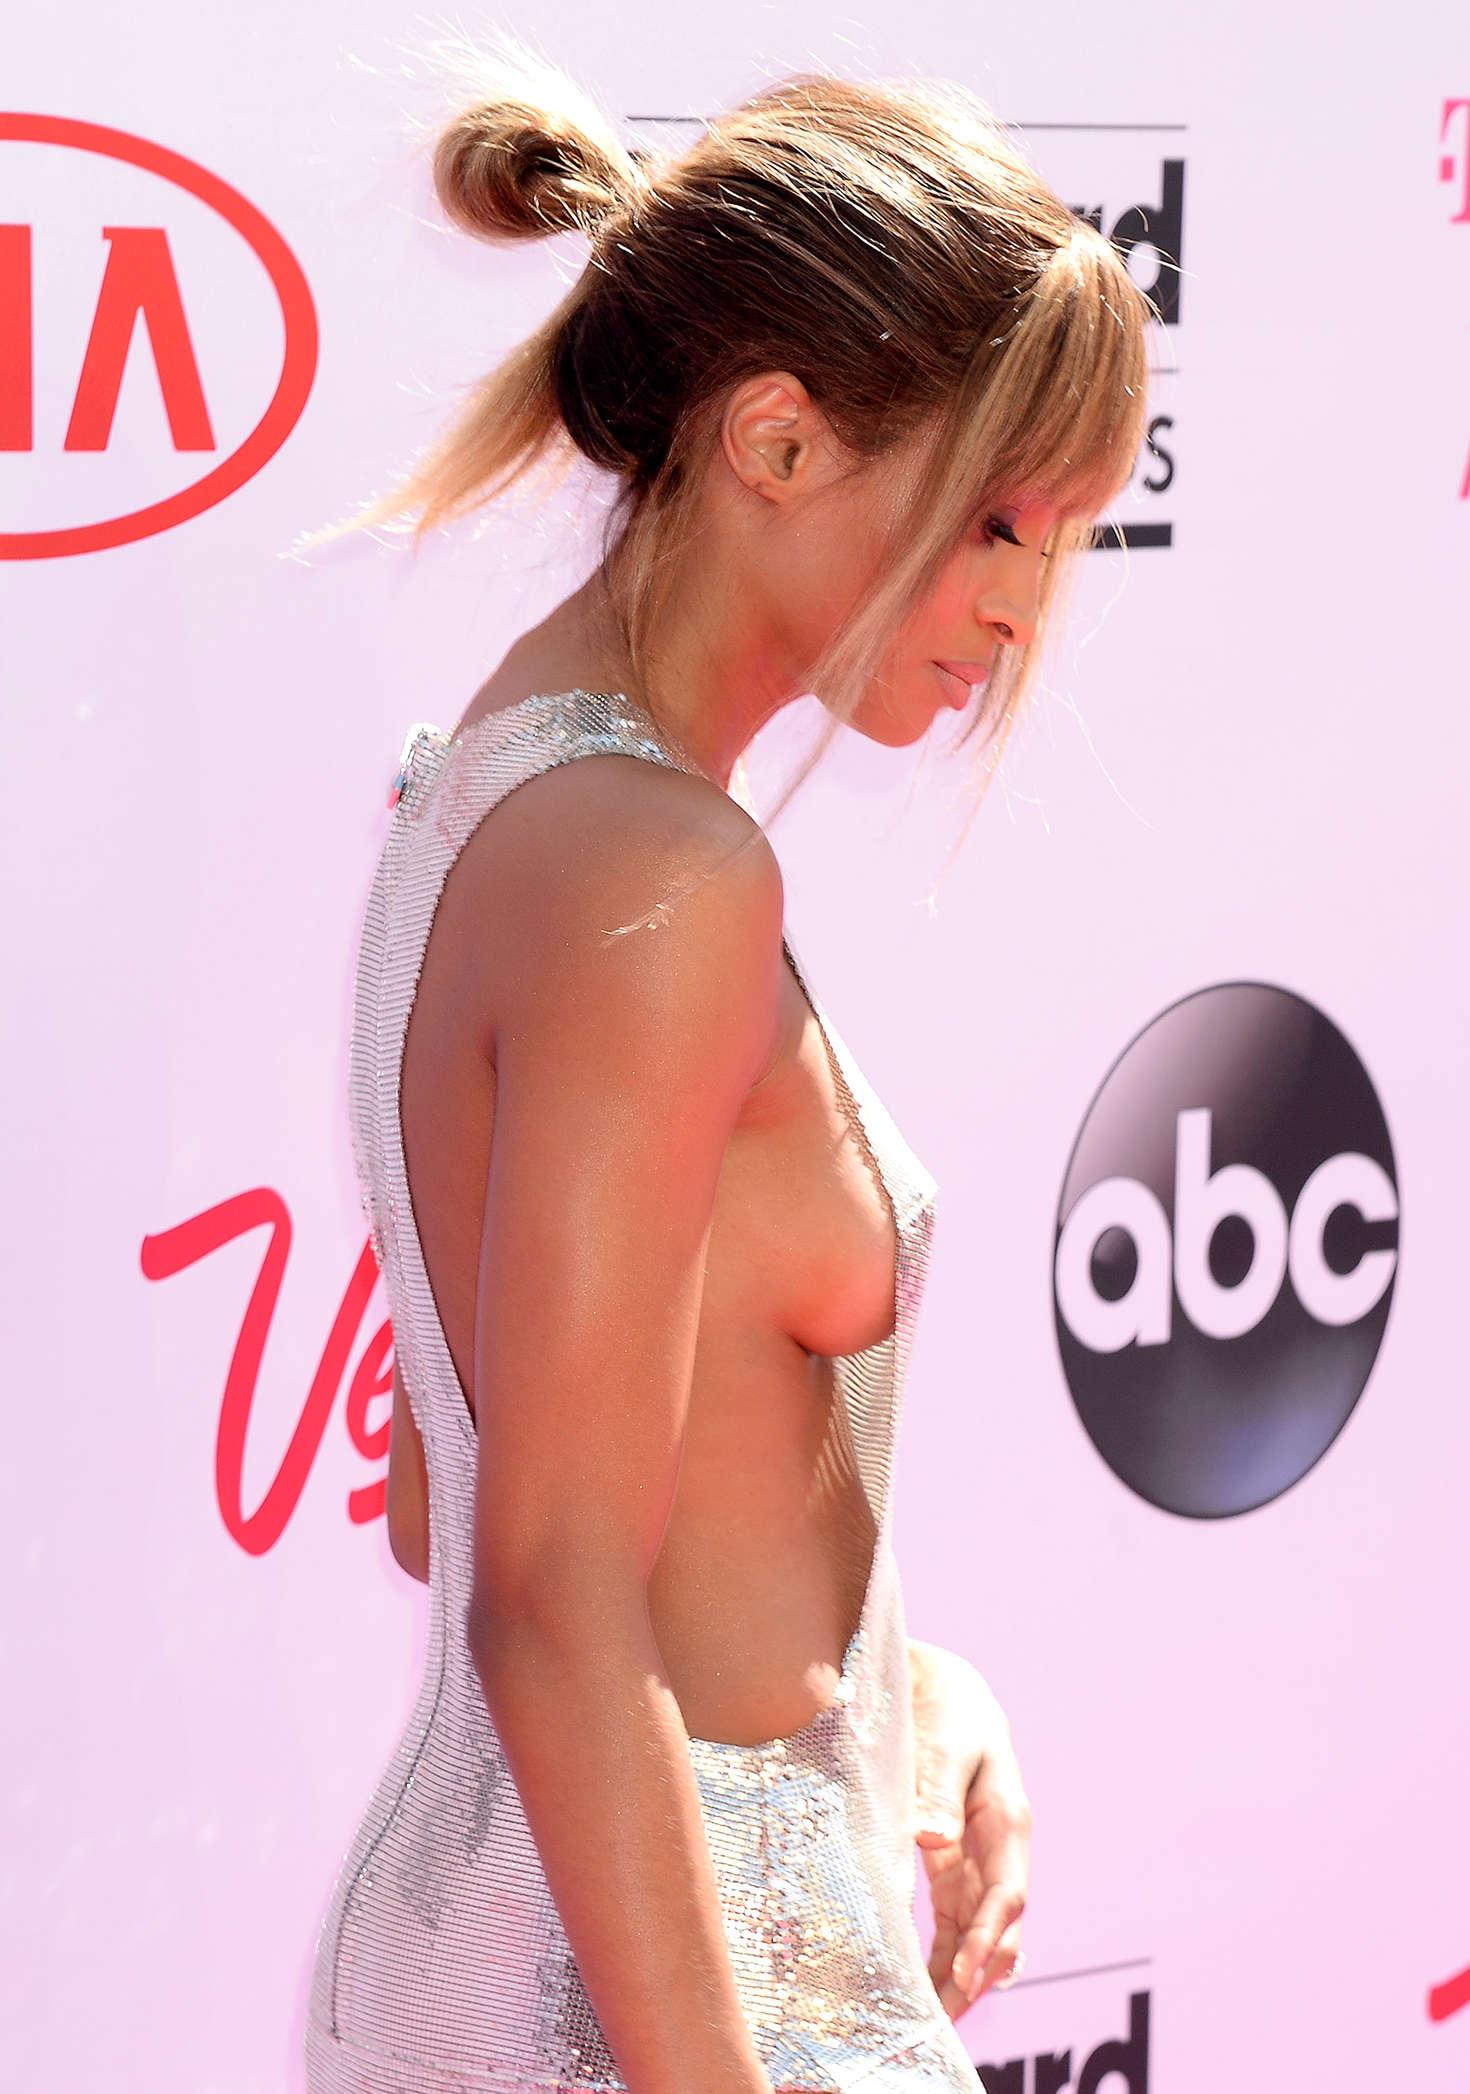 Ciara braless photos